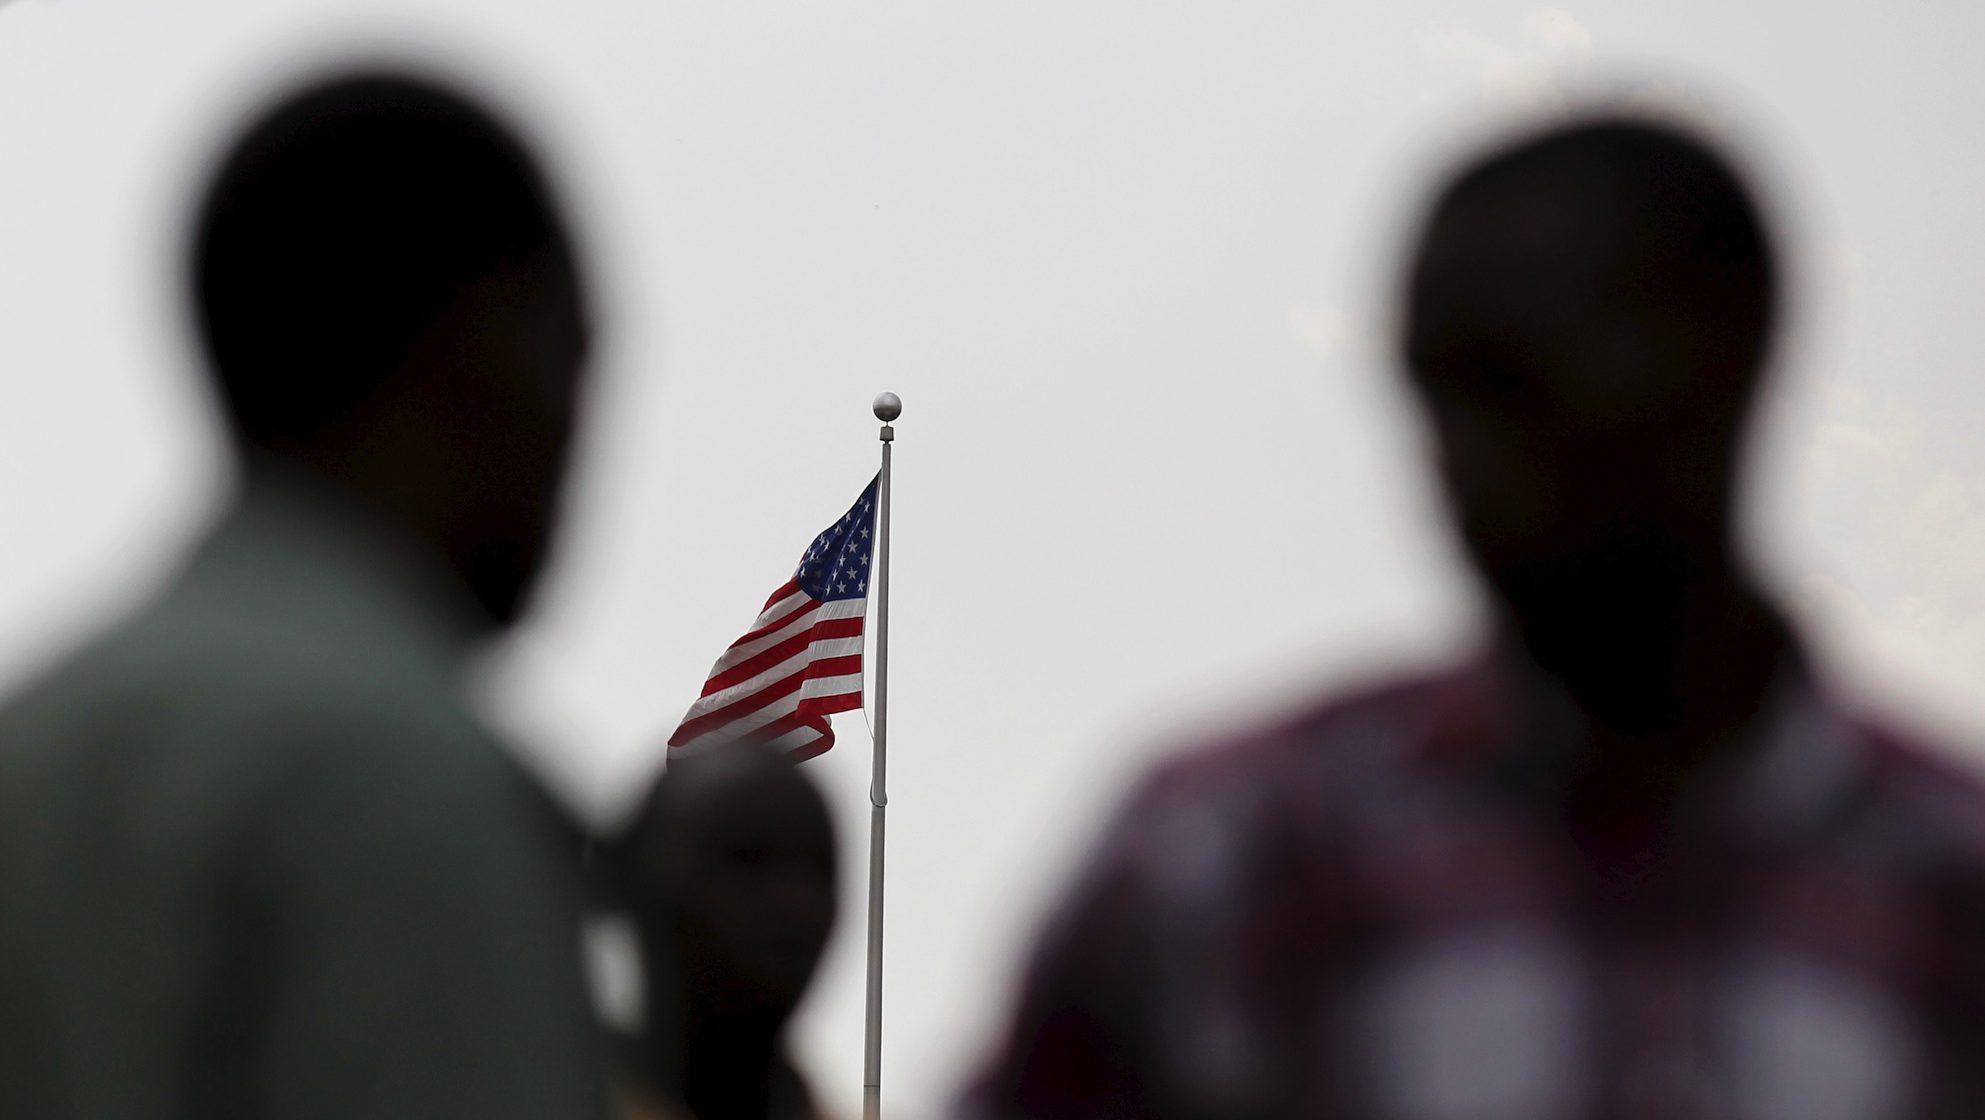 Students from a Burundi university camp outside the U.S. embassy in the capital Bujumbura